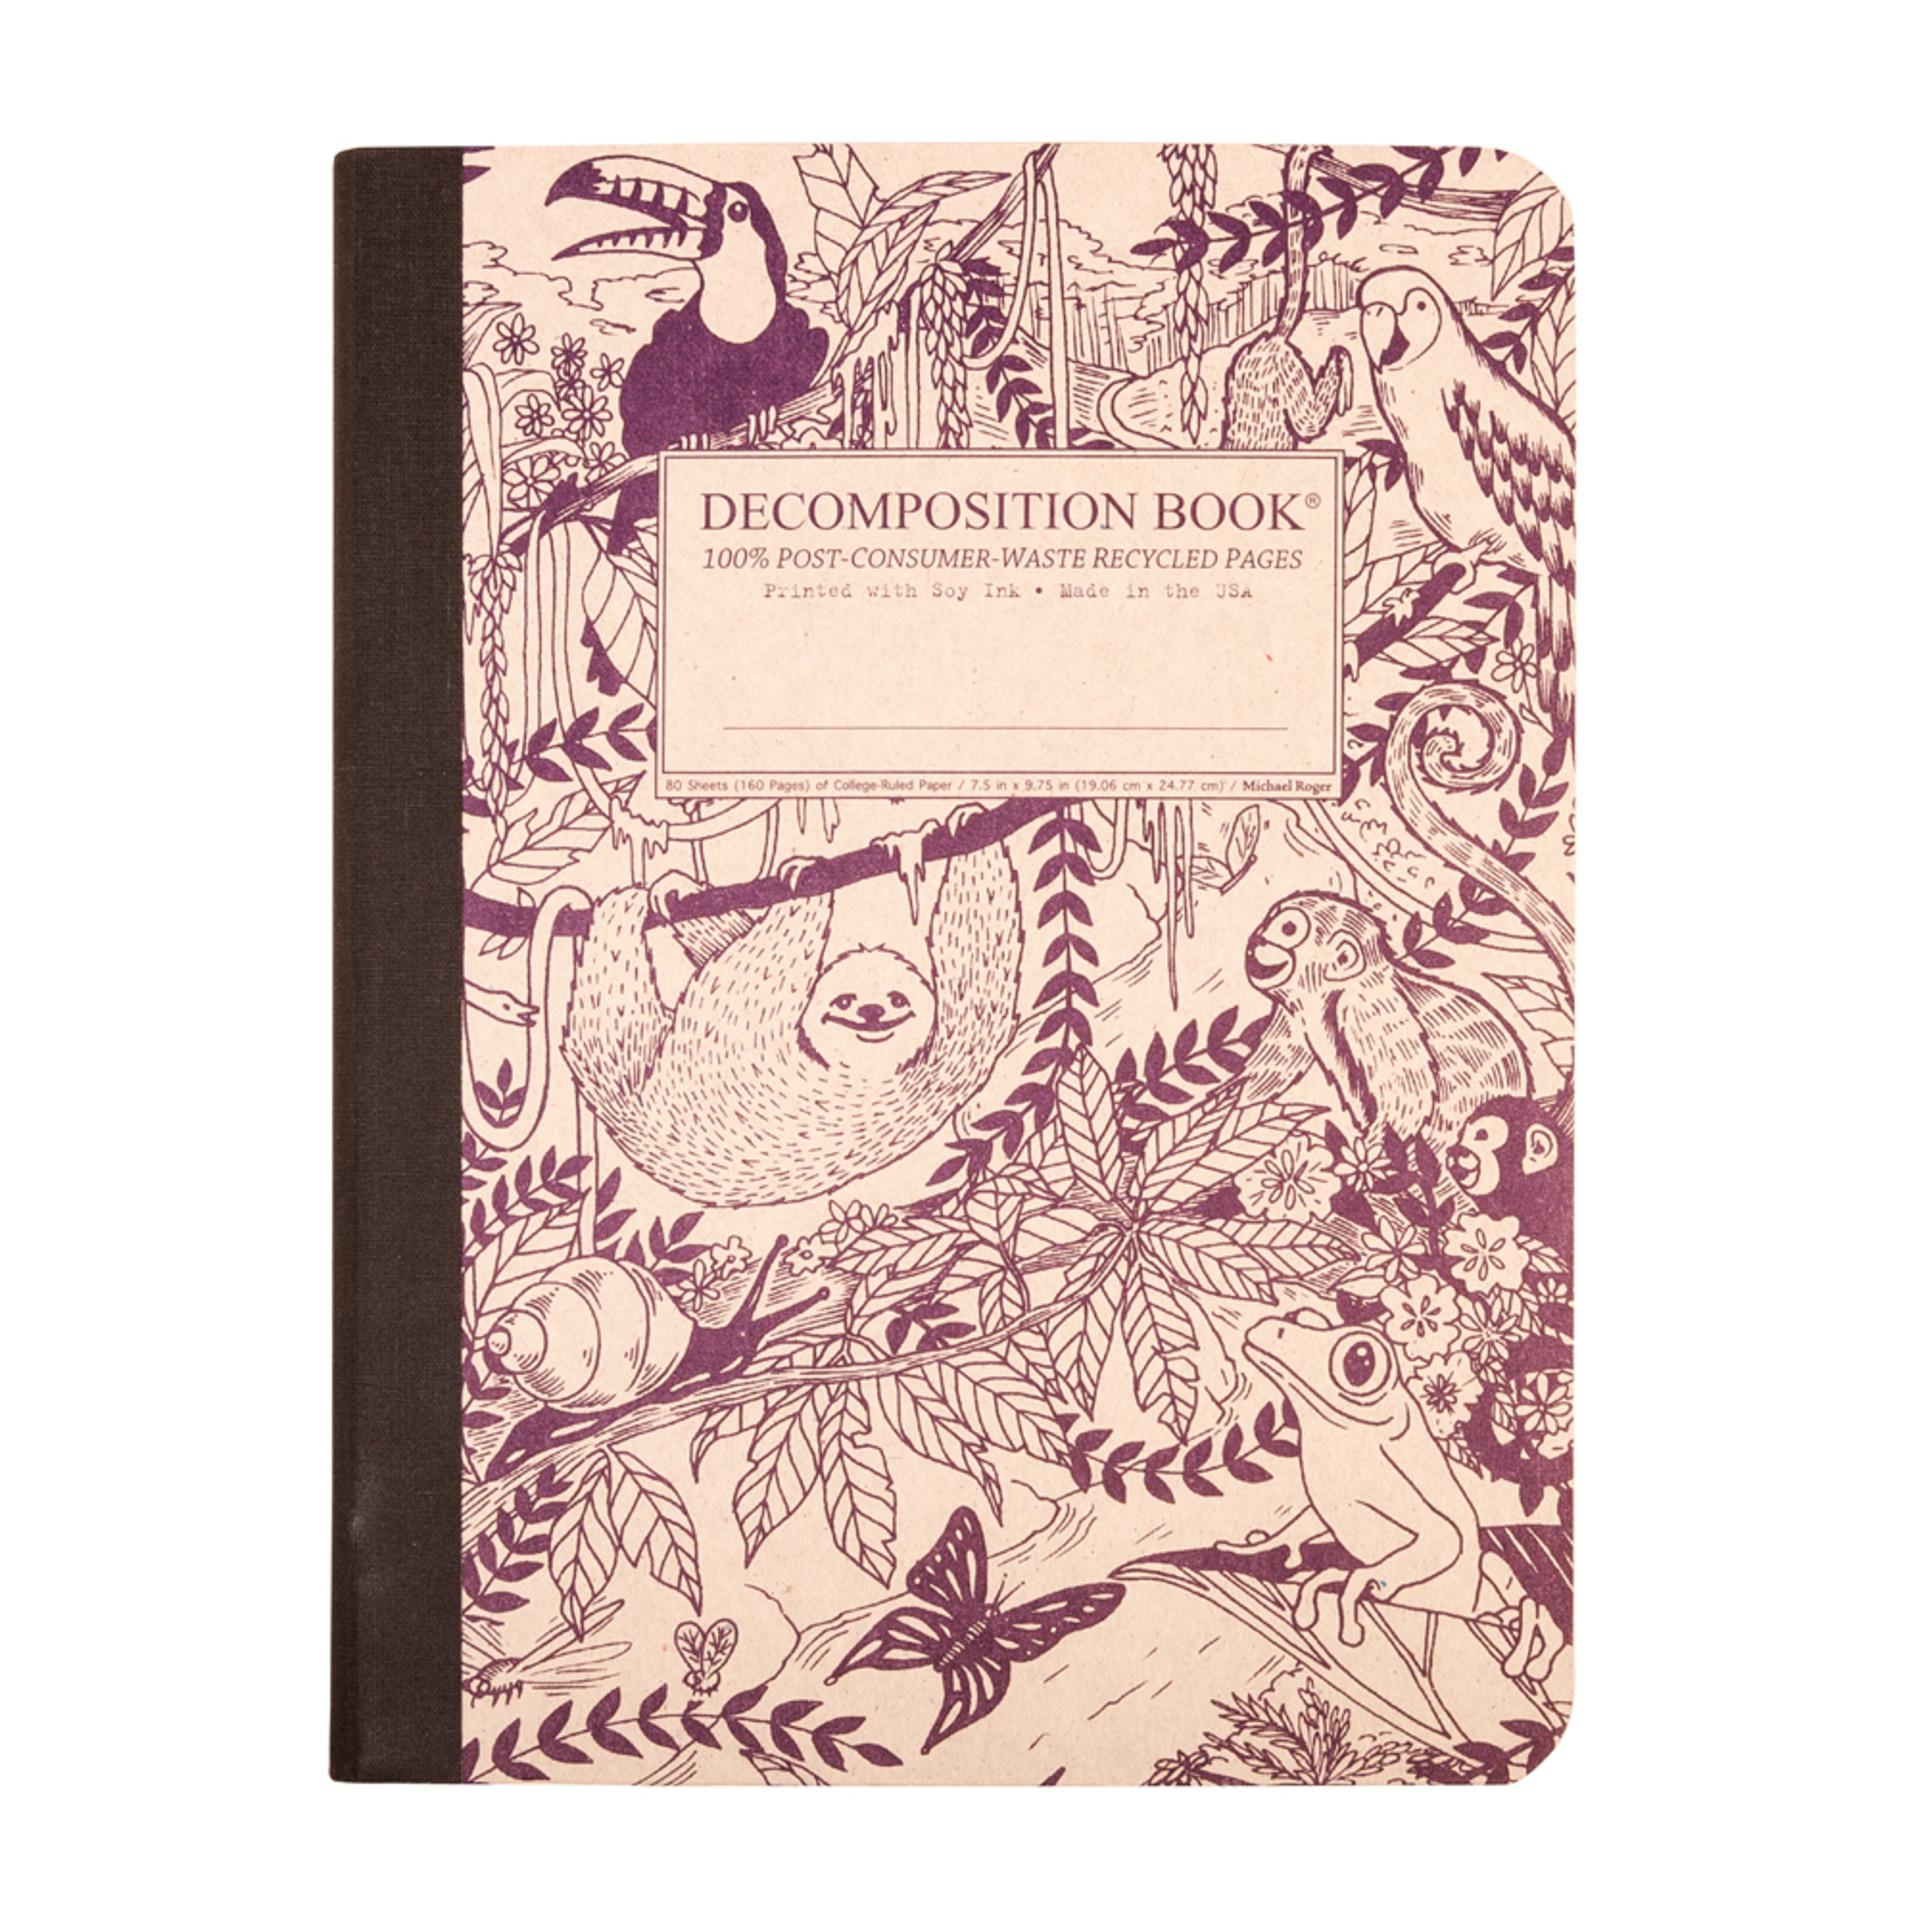 Decomposition Book Rainforest College Ruled Notebook